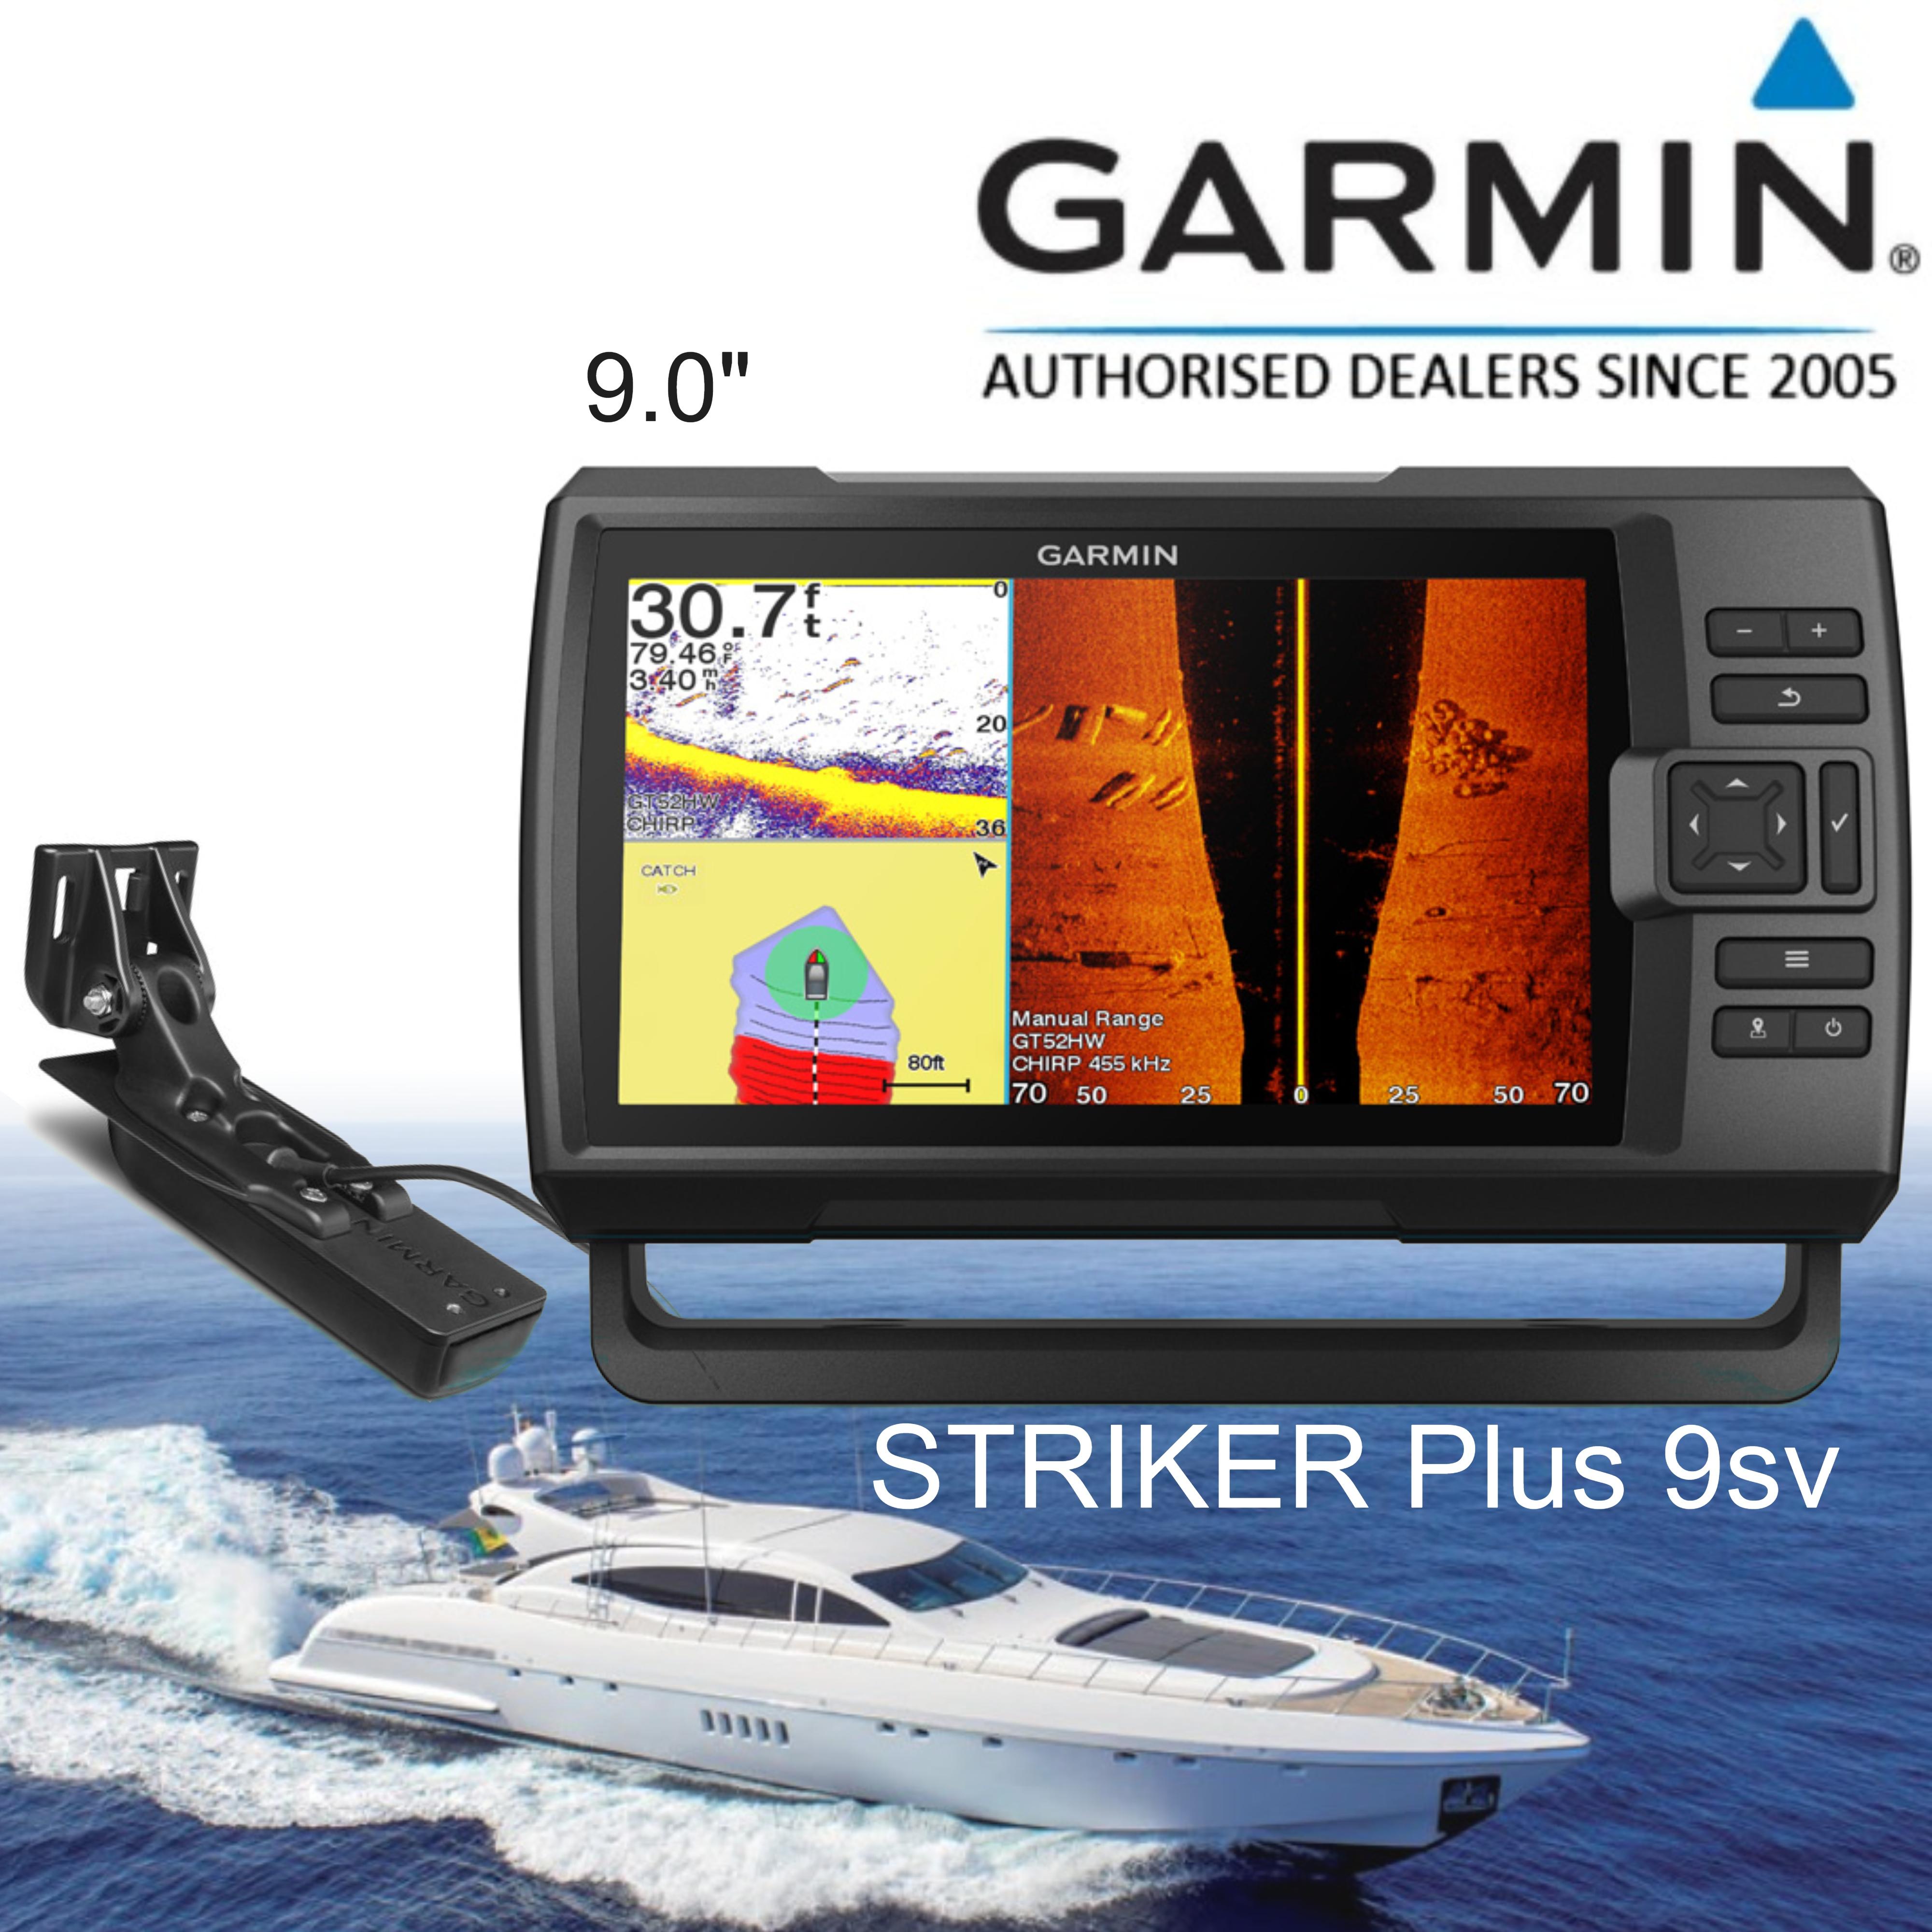 "Garmin STRIKER Plus 9sv & GT52HW-TM Transom Transducer | 9"" GPS Fish Finder | For Boat & Marine"